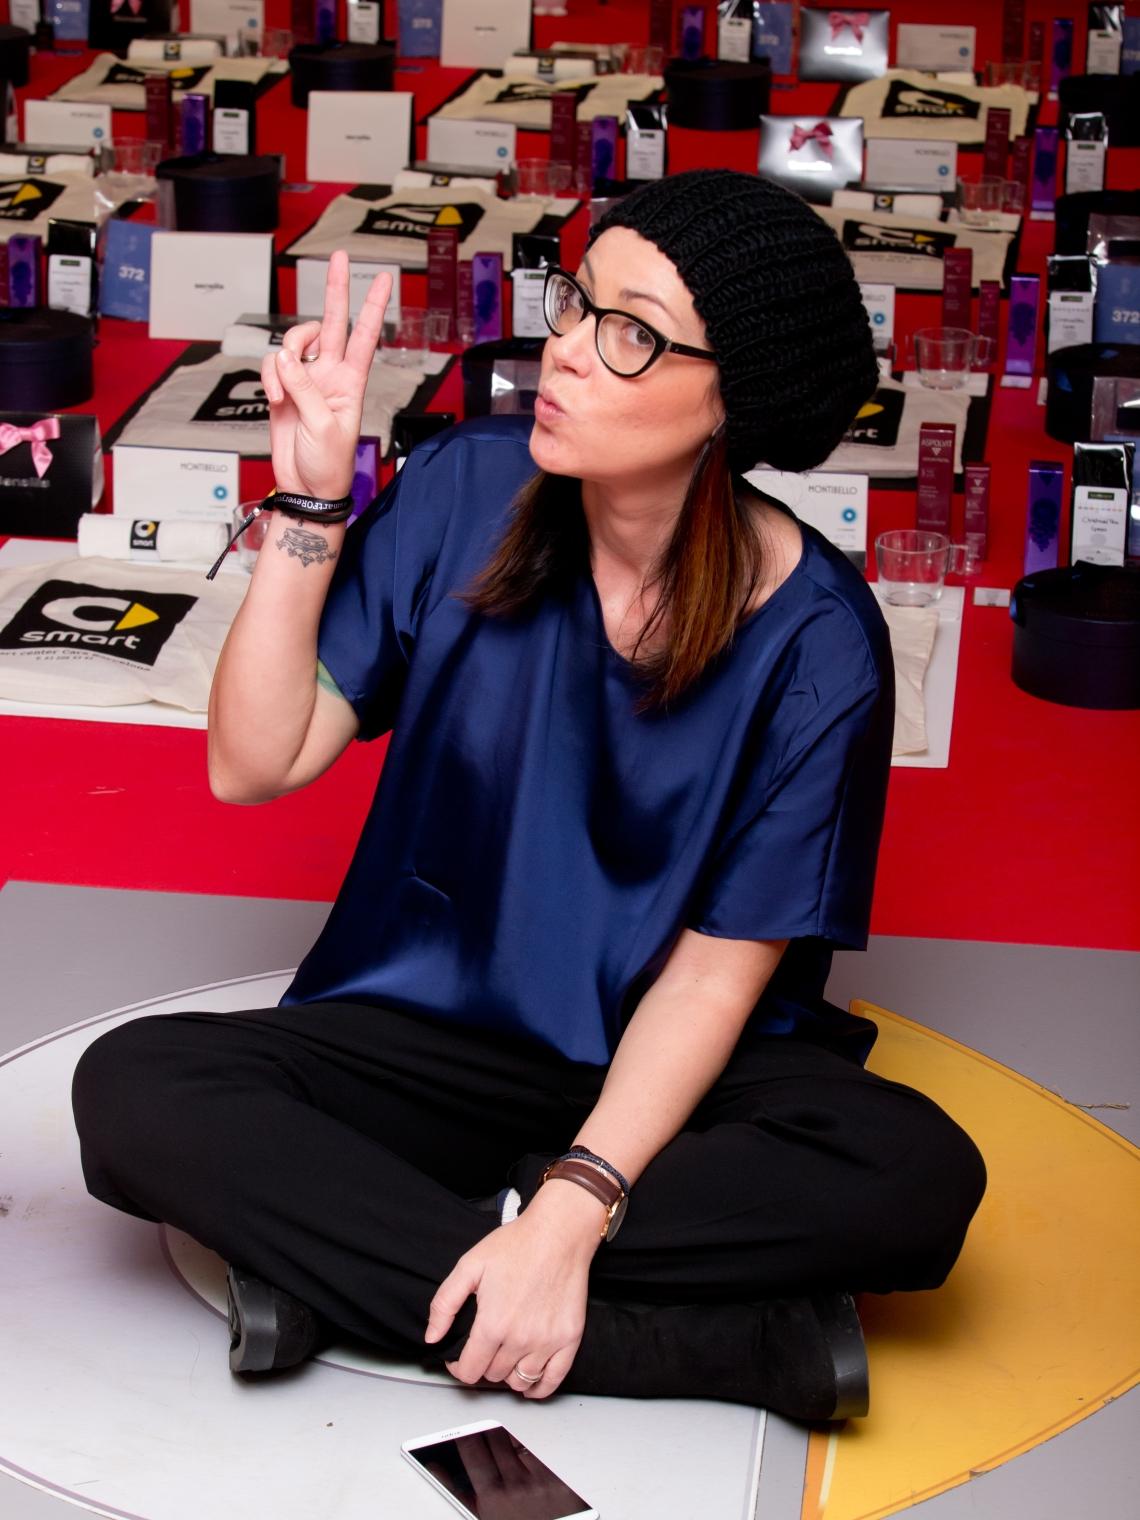 smart center barcelona normcore girl influencer #smartforbeauty